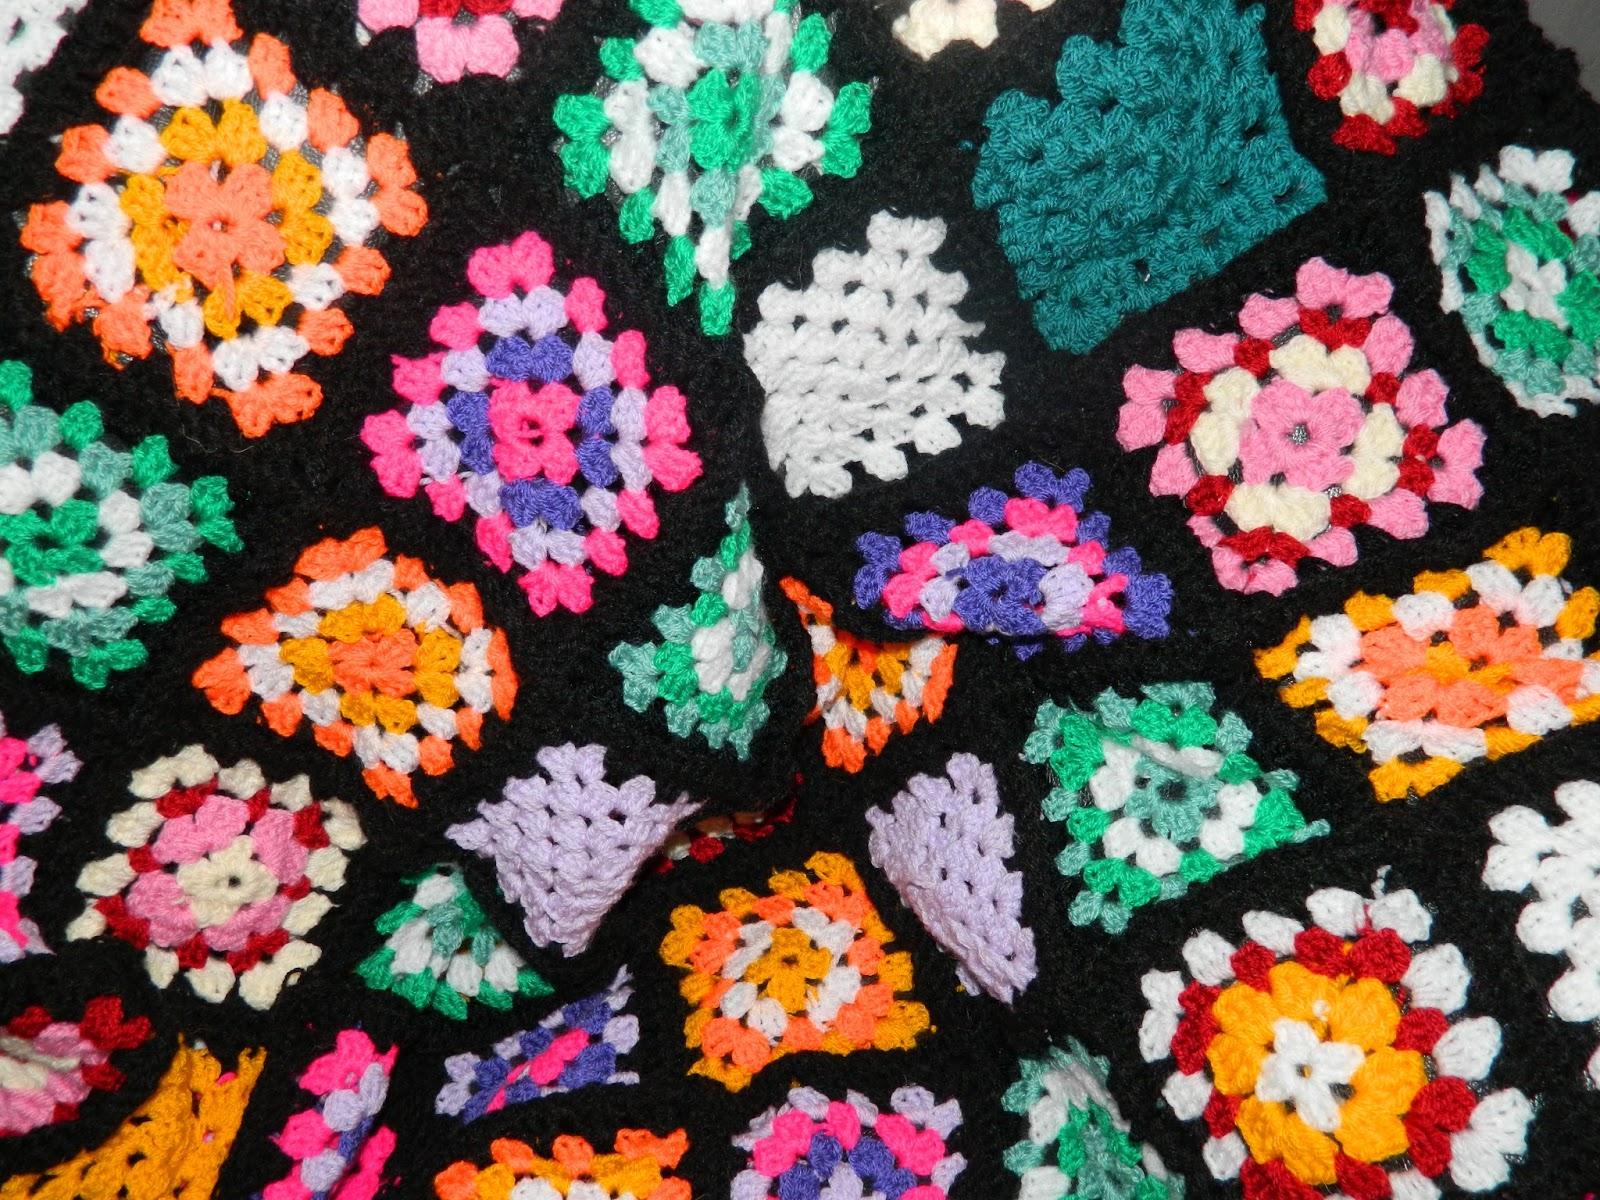 colour burst afghan throw, granny squares